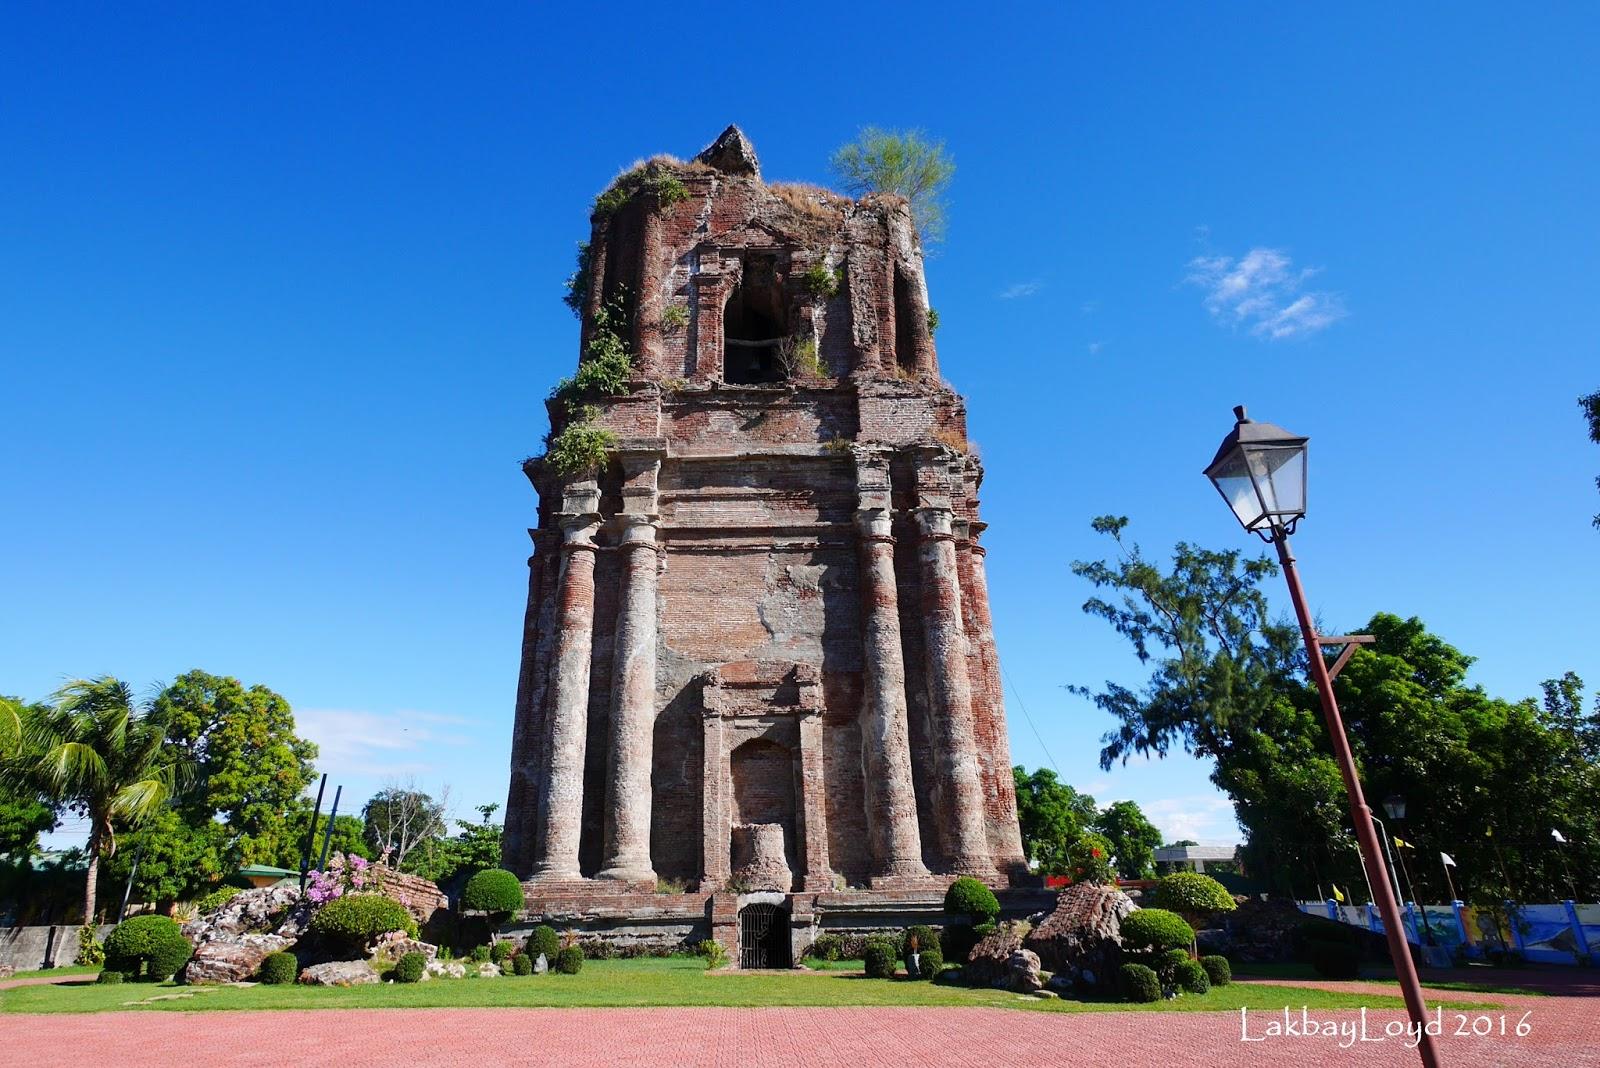 Lakbayloyd National Cultural Treasure Series San Andres Apostol Parish Church Bacarra Ilocos Norte Ph 01 0006 Nct